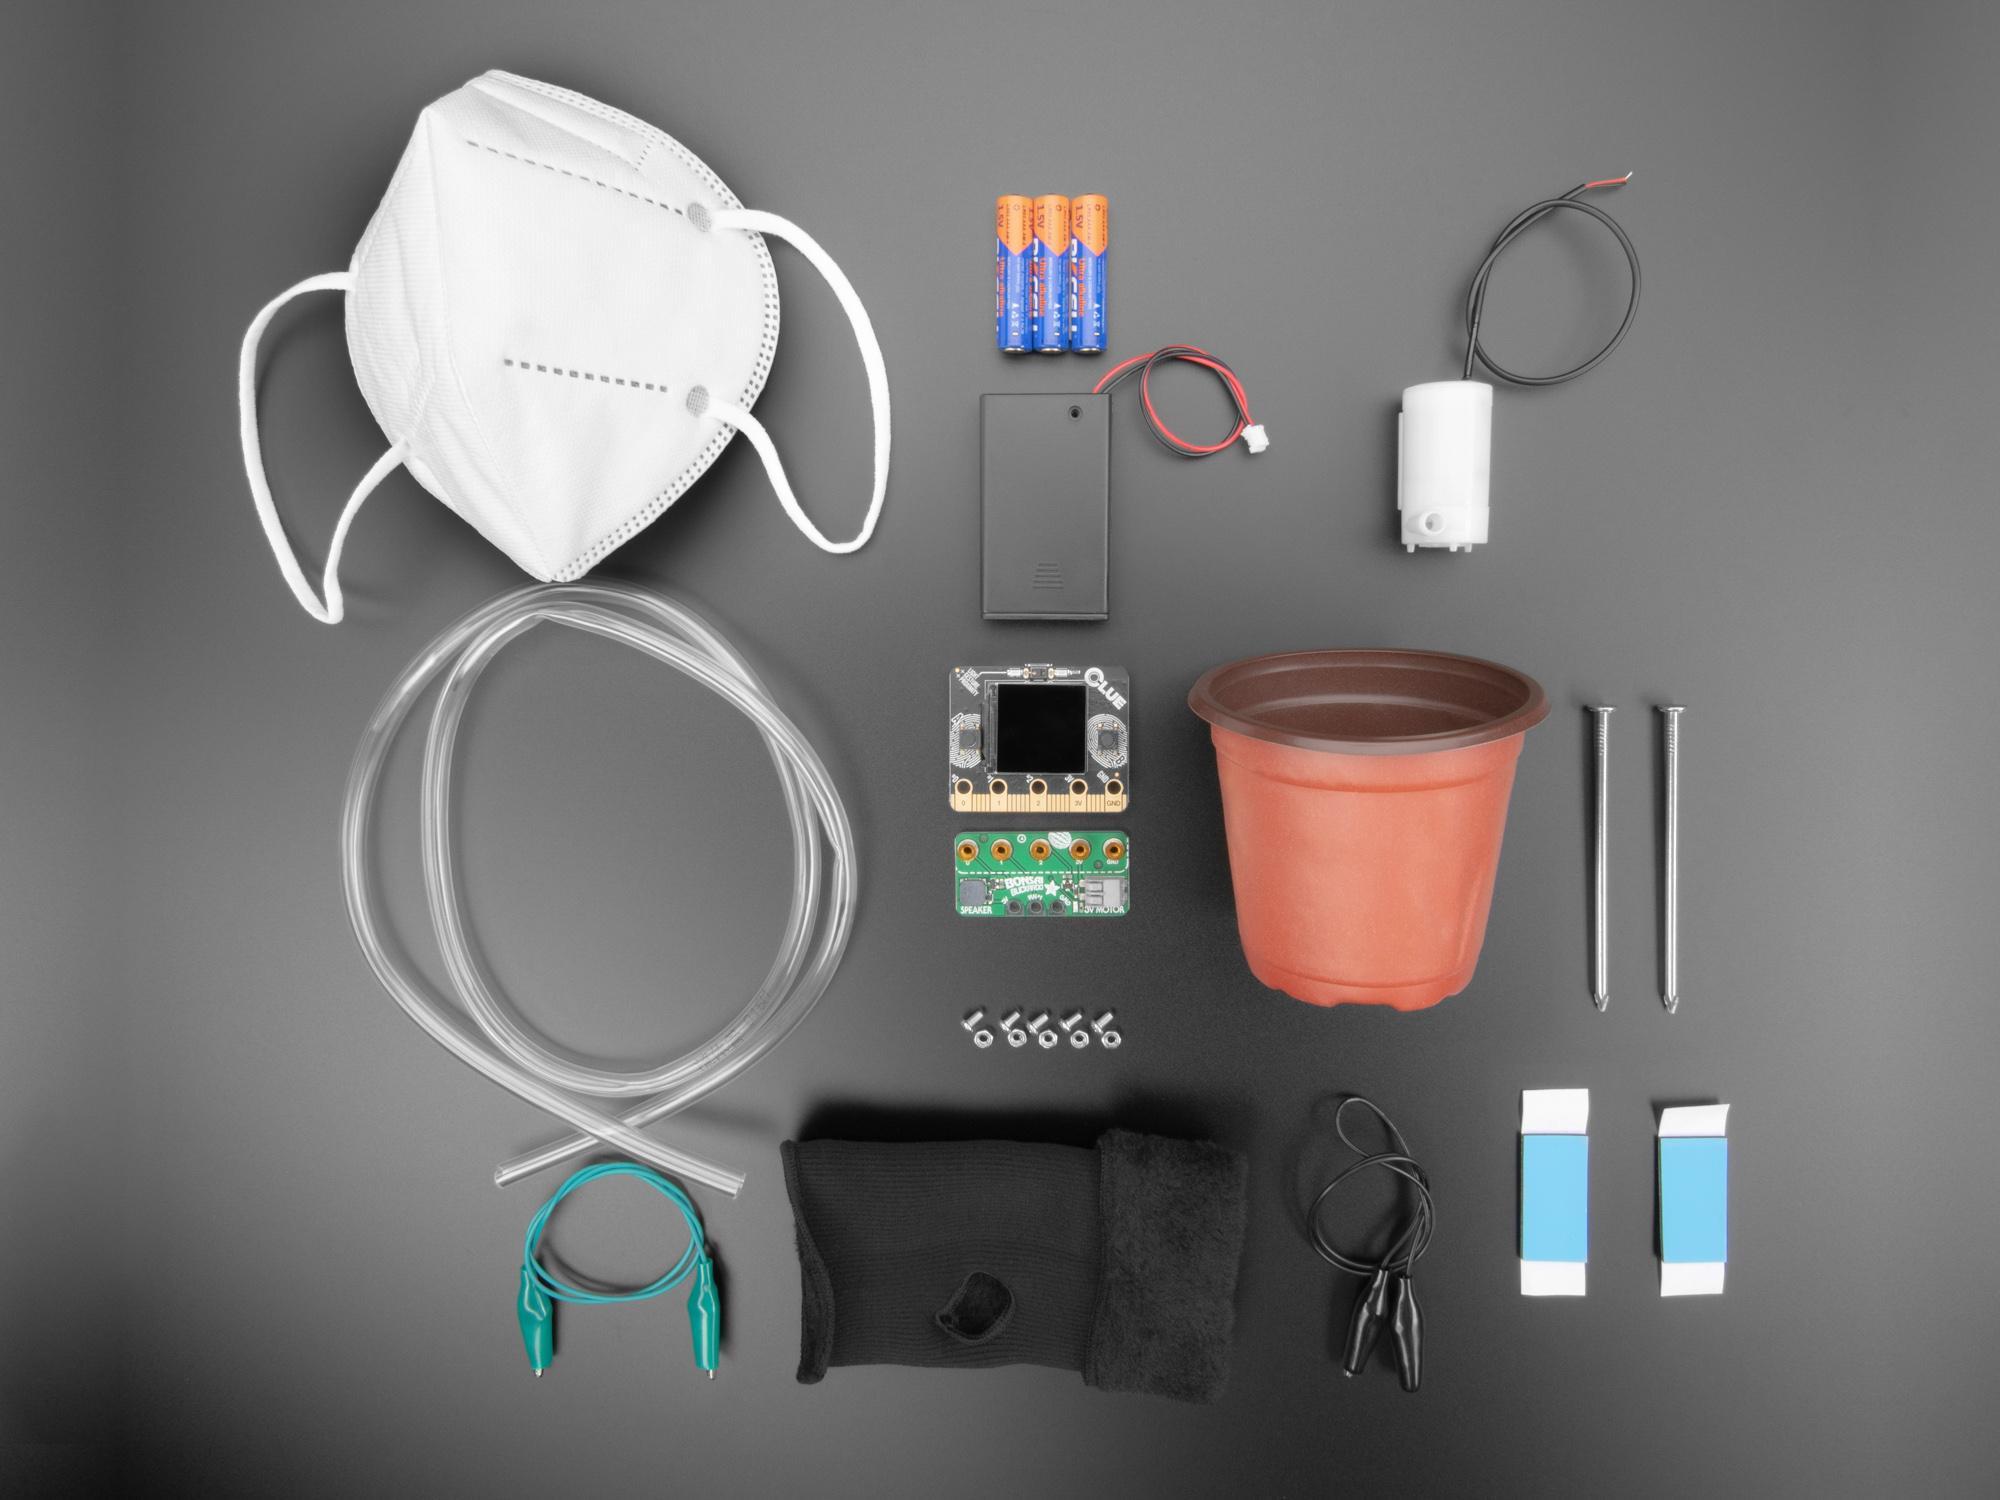 sensors_AdaBox015_kit.jpg